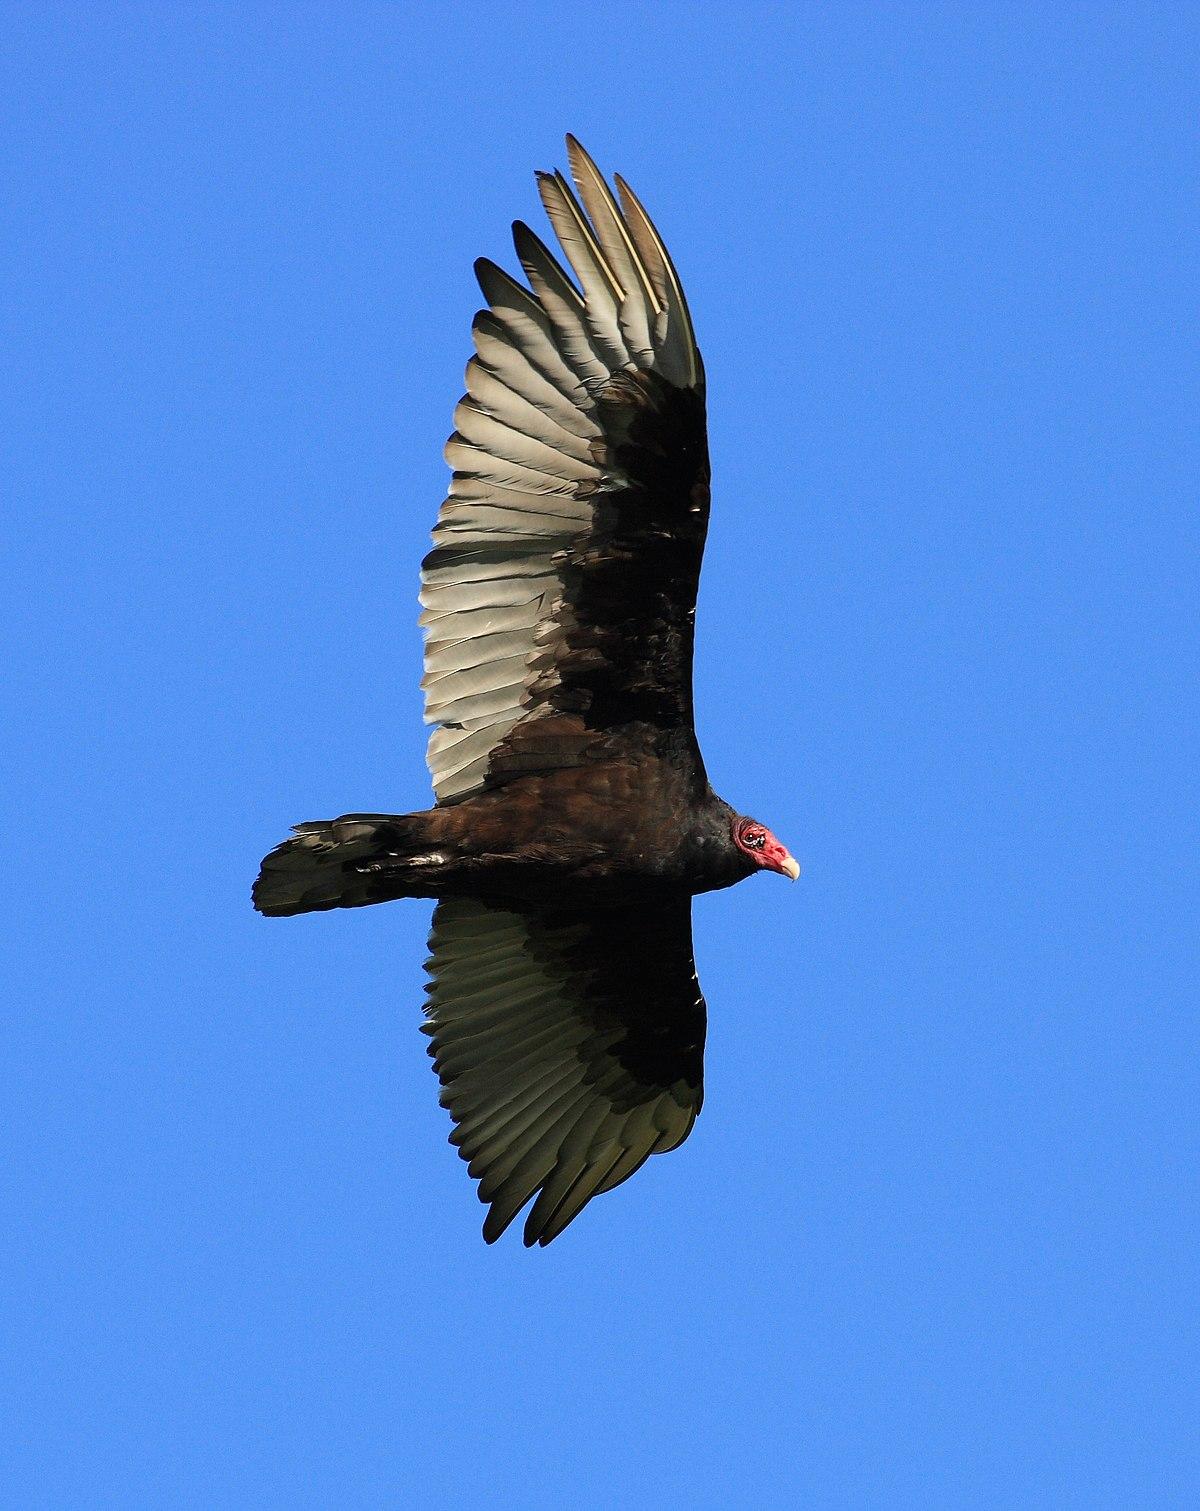 Oiseau Qui Vole Le Plus Haut : oiseau, Charge, Alaire, (oiseau), Wikipédia